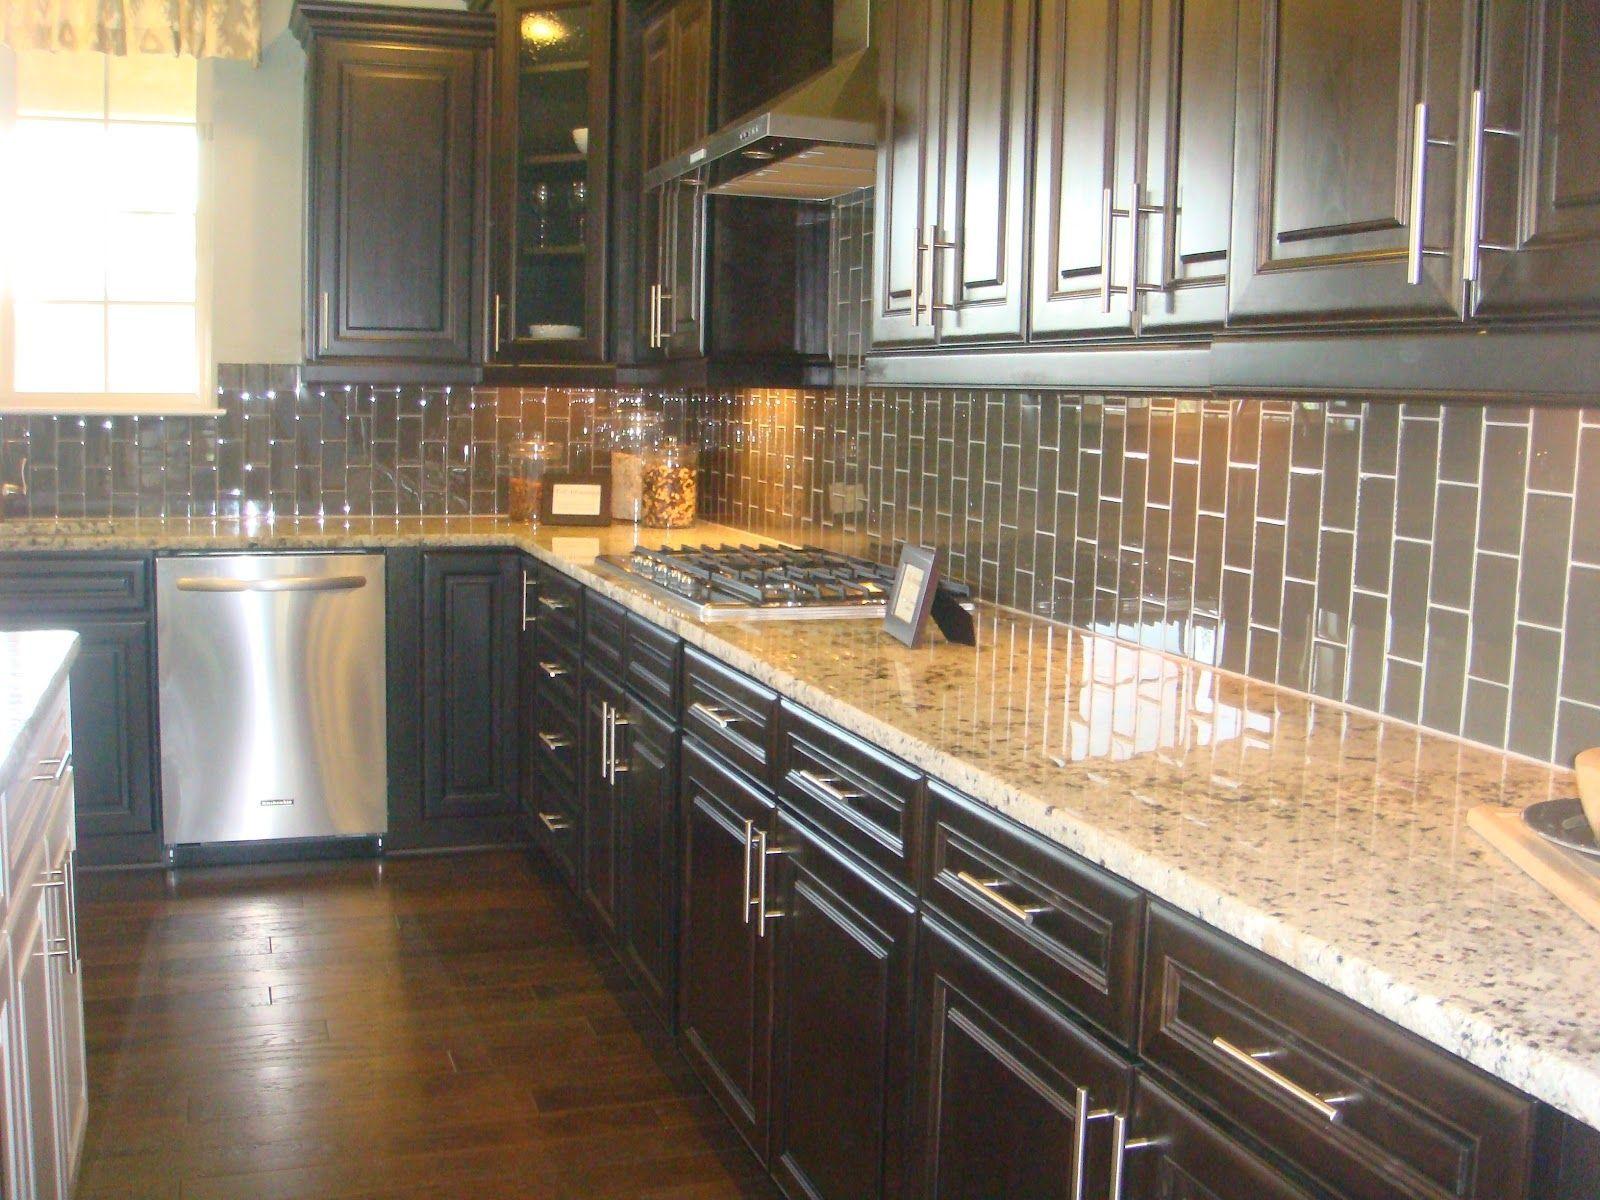 47 Old Fashioned Backsplash Tiles Illustration Decortez Shaker Style Kitchen Cabinets Kitchen Tiles Design Espresso Kitchen Cabinets